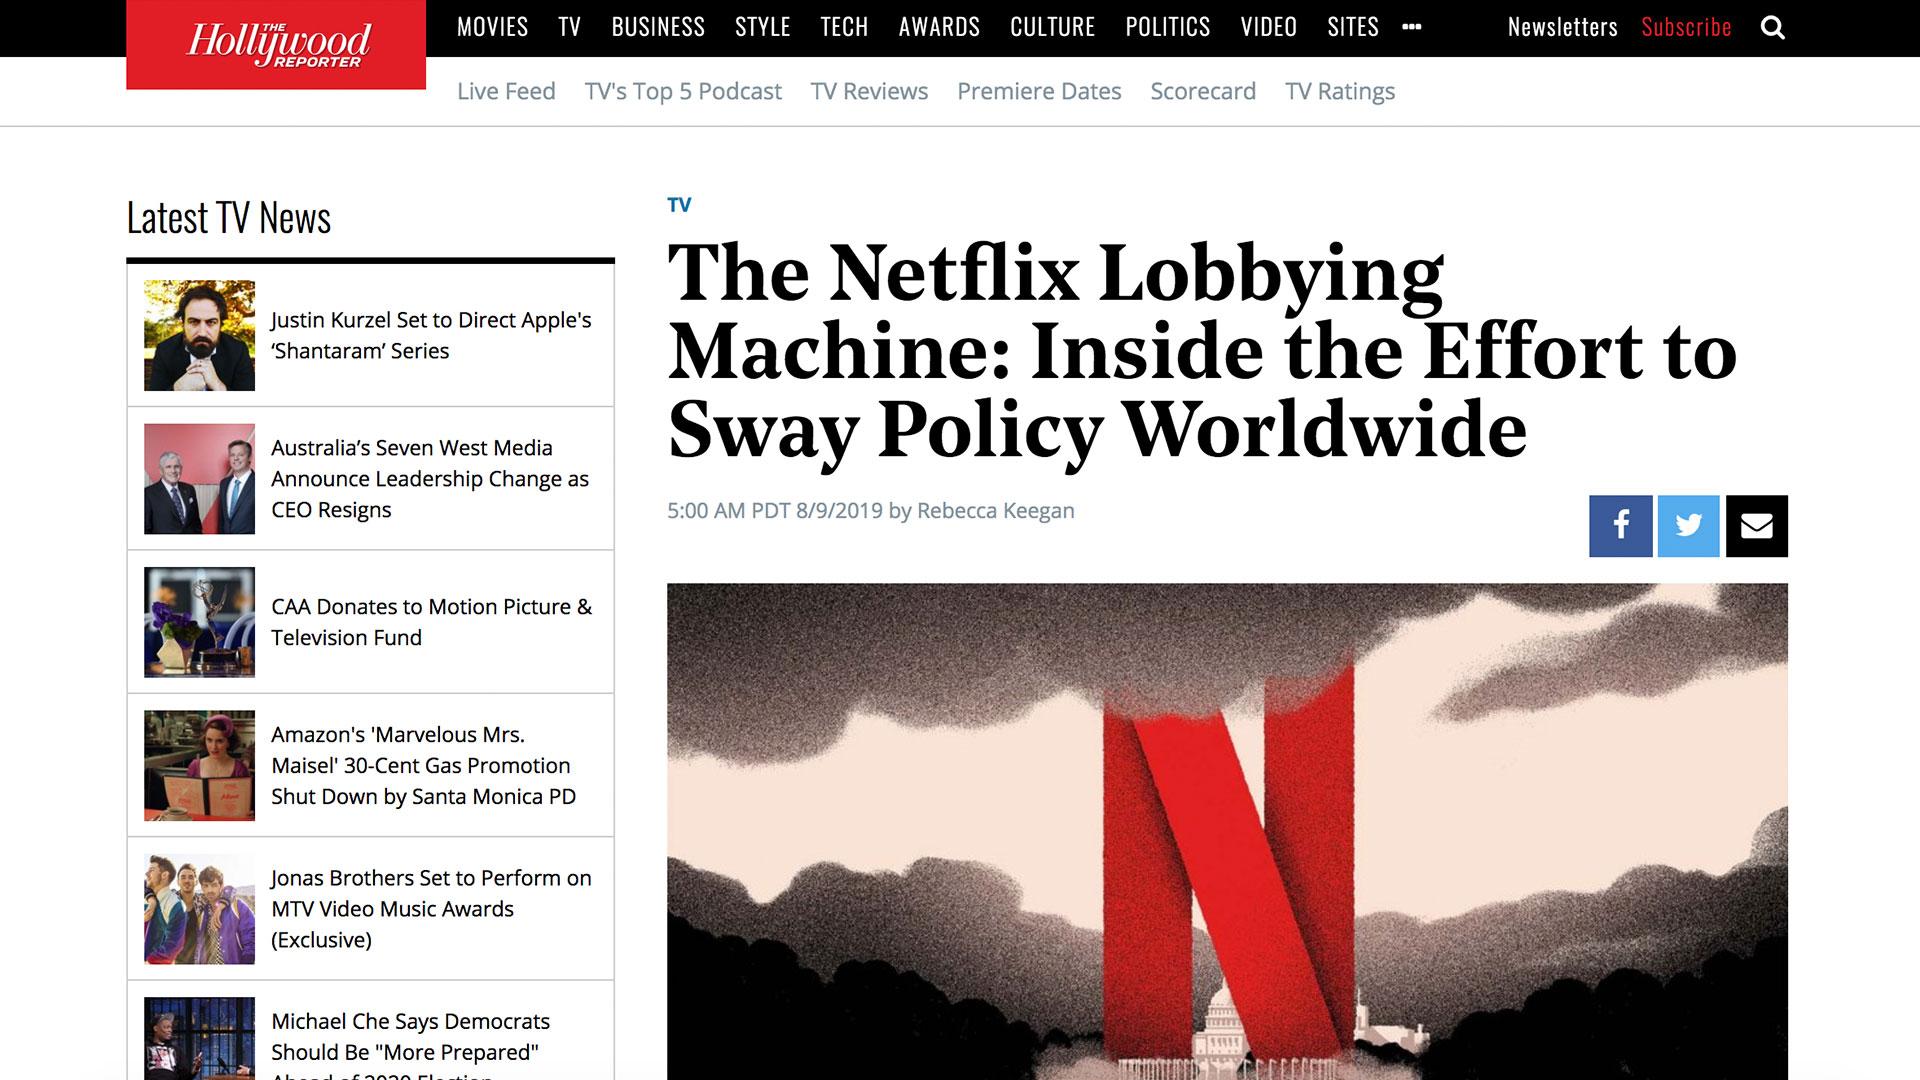 Fairness Rocks News The Netflix Lobbying Machine: Inside the Effort to Sway Policy Worldwide